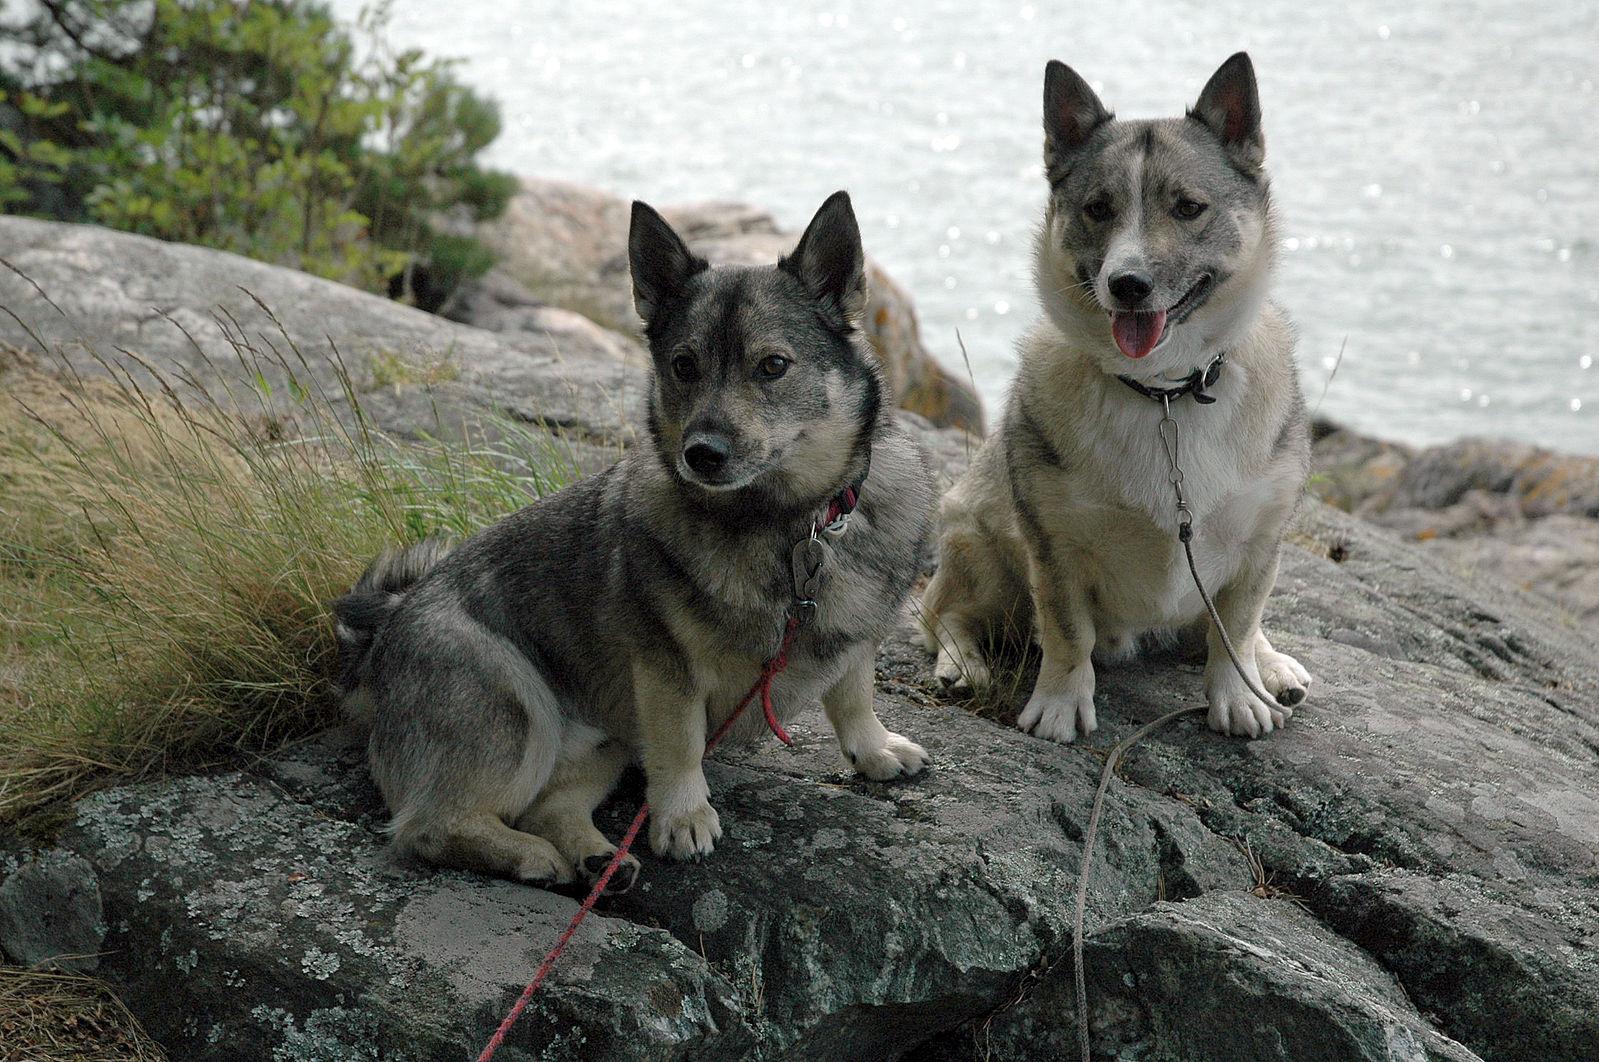 Swedish Vallhund,Vikings,Welsh Corgi,herding dog,sweden,